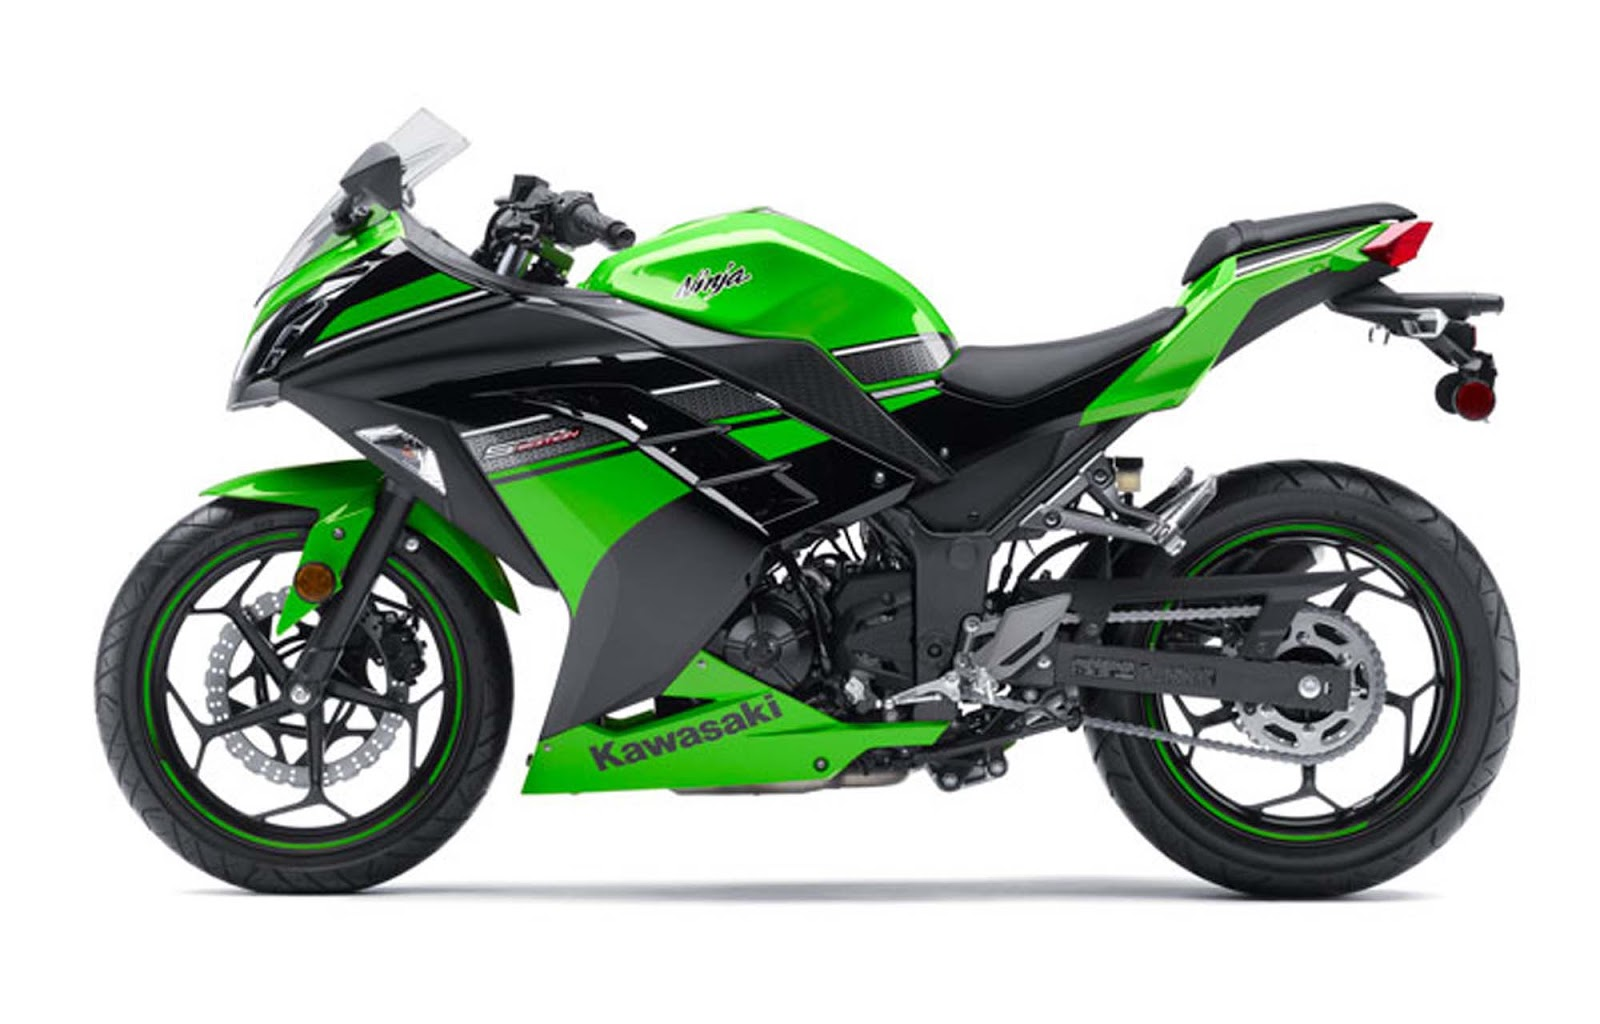 kawasaki motor bikes 2013 kawasaki ninja 300 special edition abs. Black Bedroom Furniture Sets. Home Design Ideas